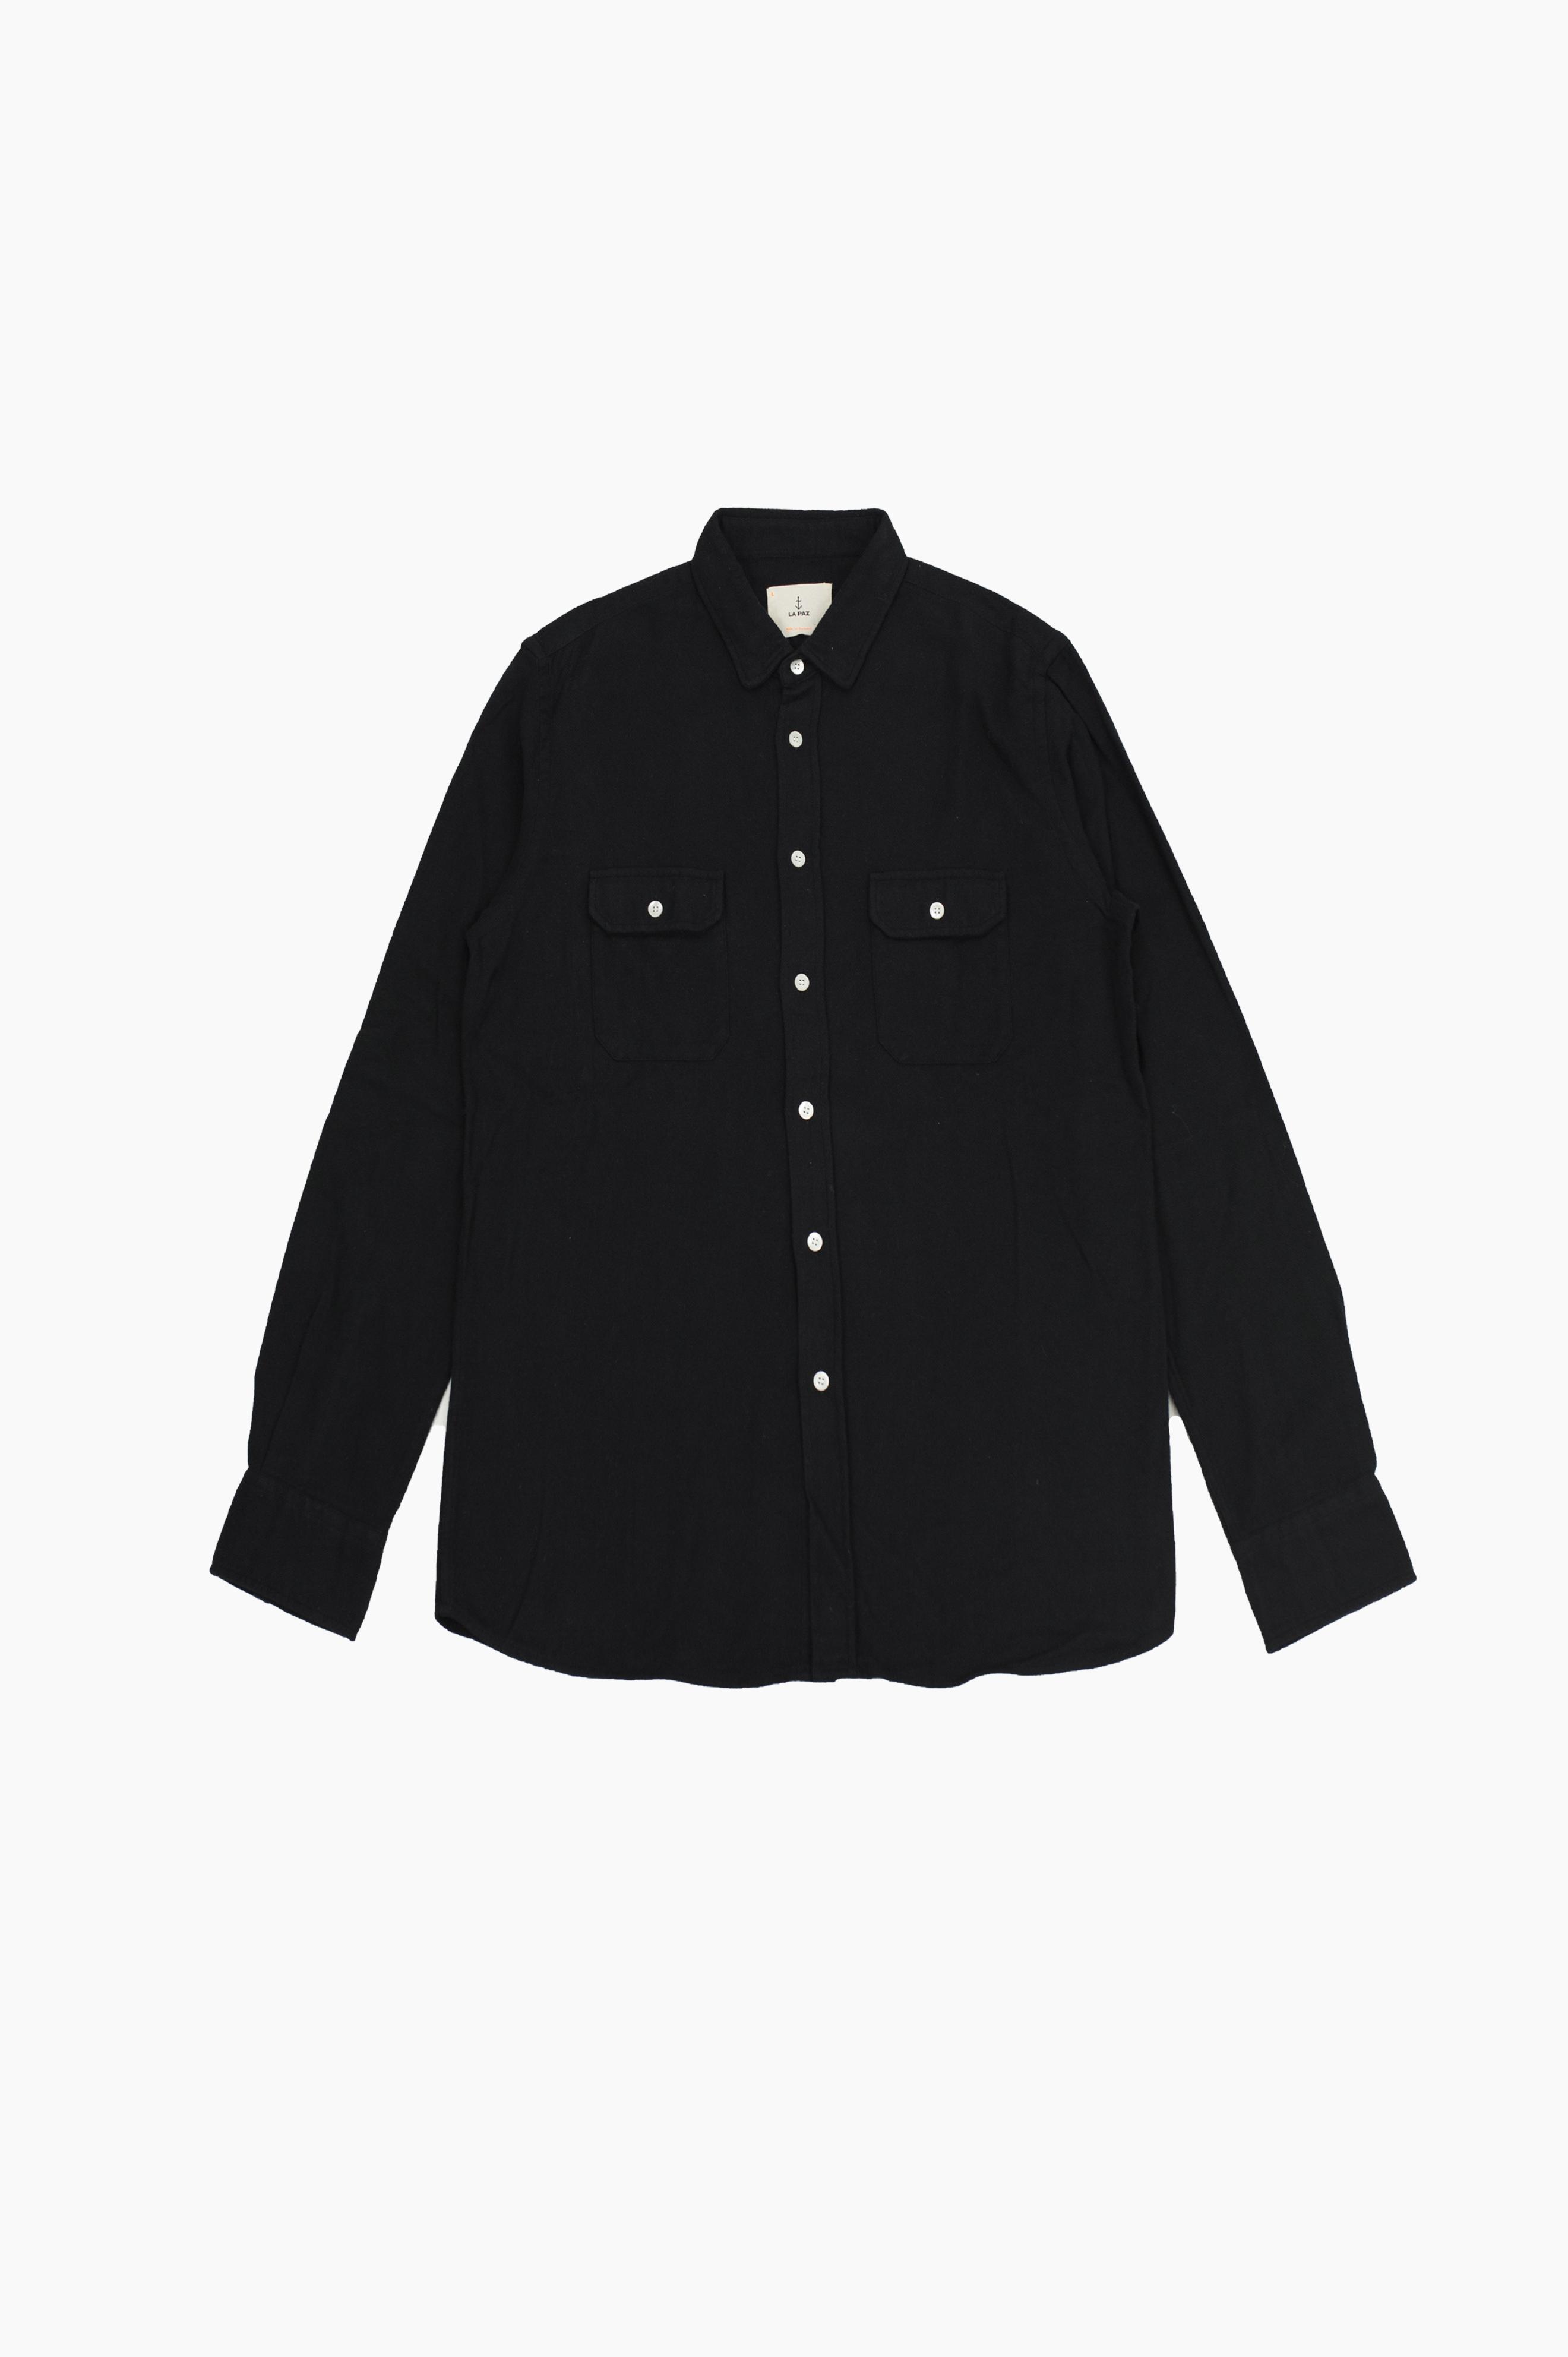 Pacheco Shirt Black